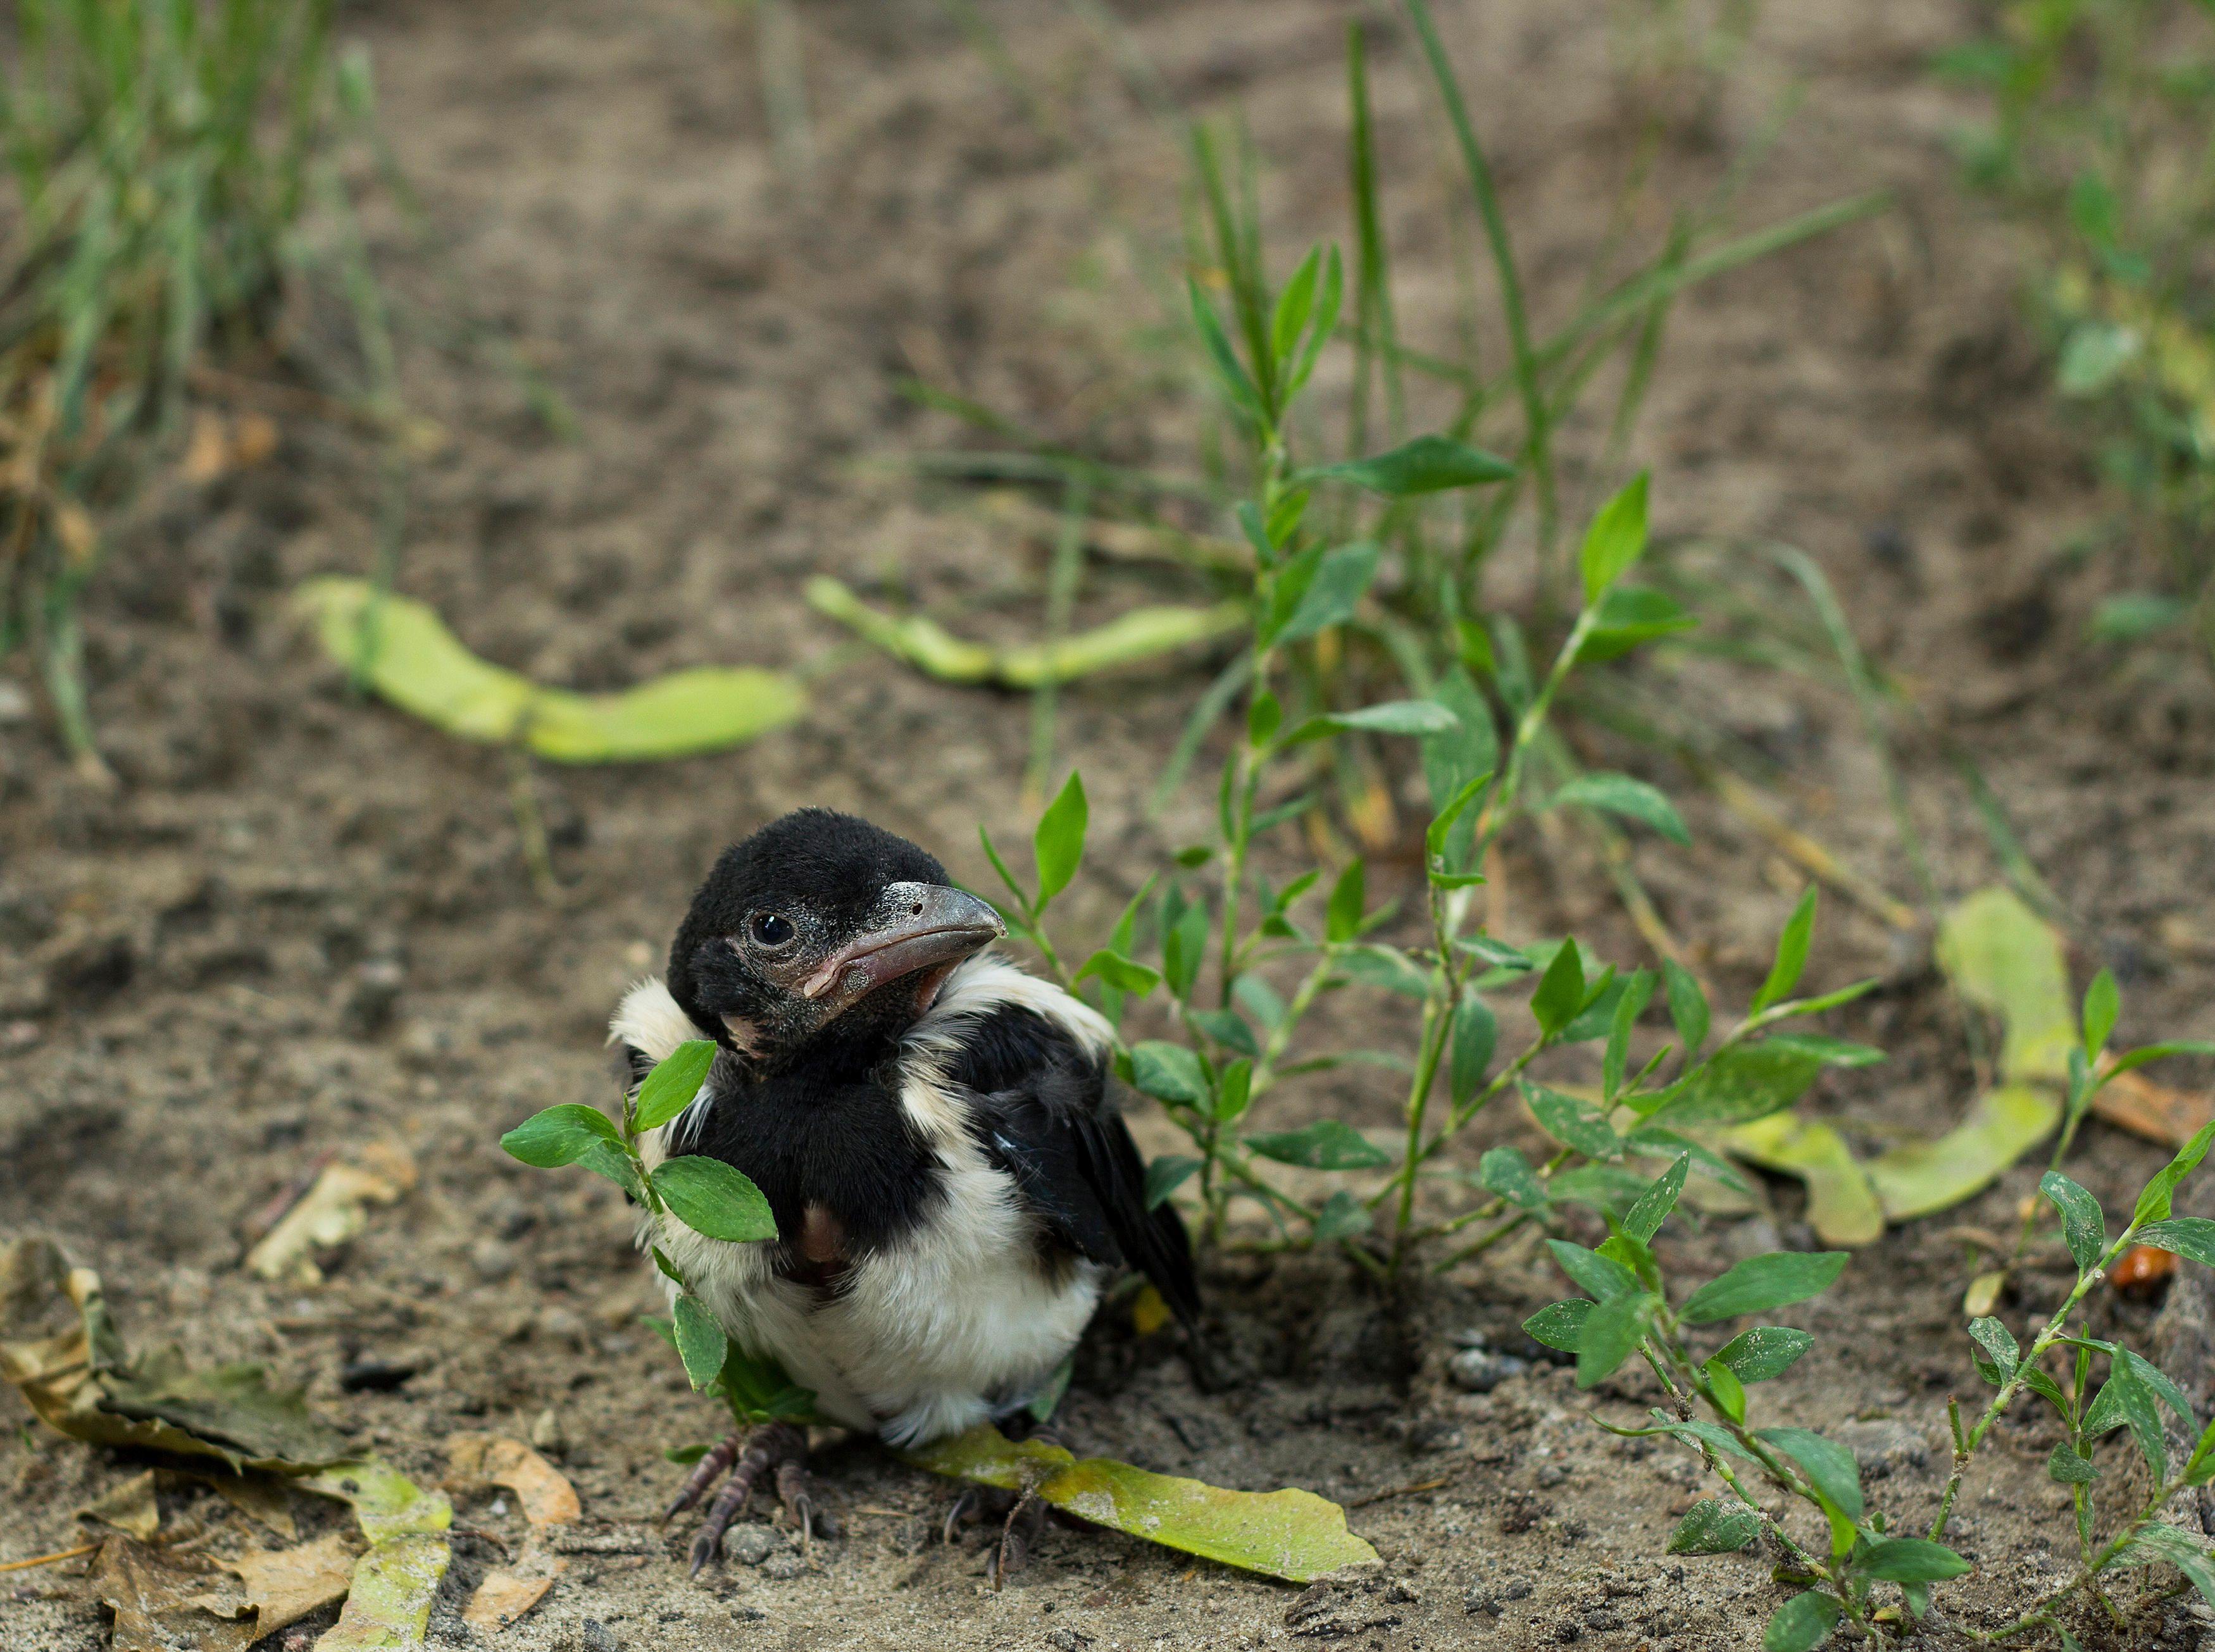 fugl, fugleunge, dyr, dyrenes beskyttelse,